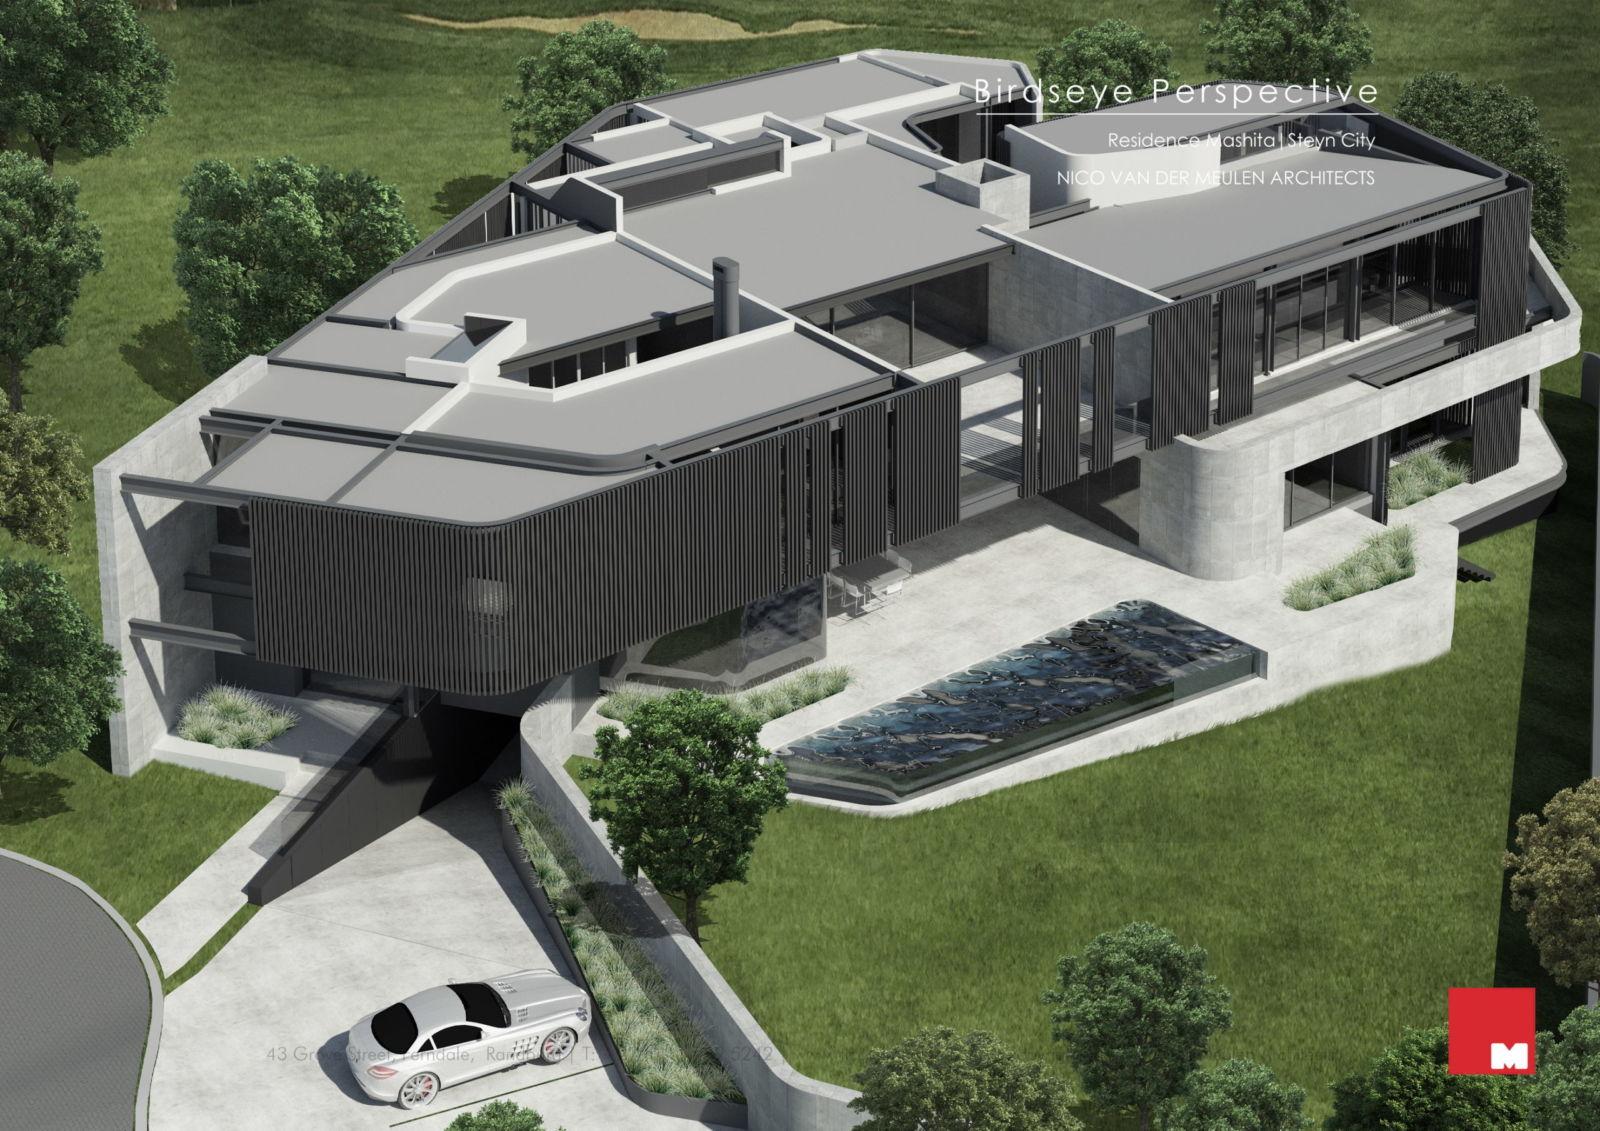 Maison à Steyn City